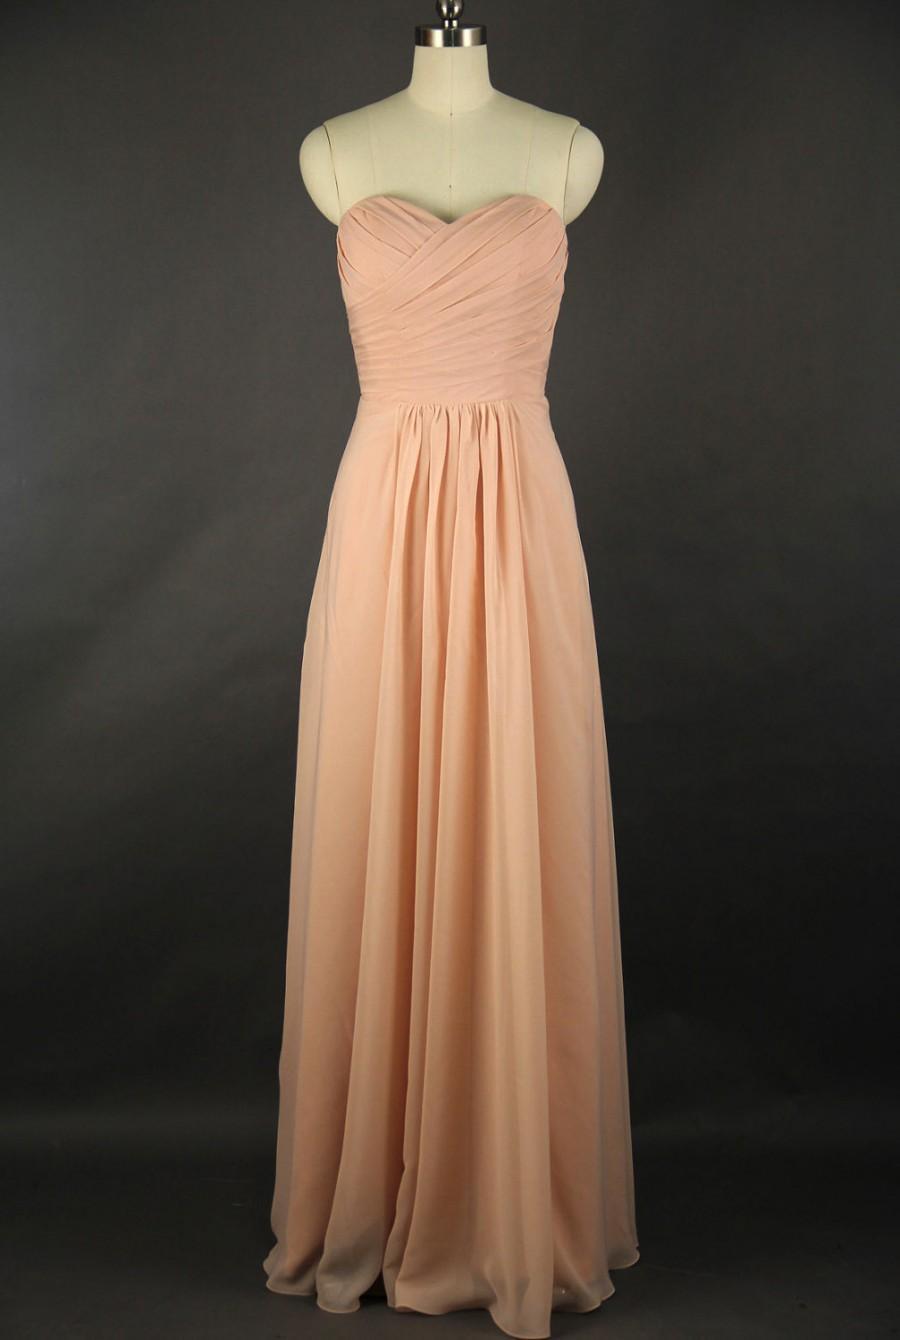 Düğün - Sweetheart Bridesmaid Dress, A-line Floor-length Chiffon Bridesmaid Dress, Pearl Pink Bridesmaids Dress